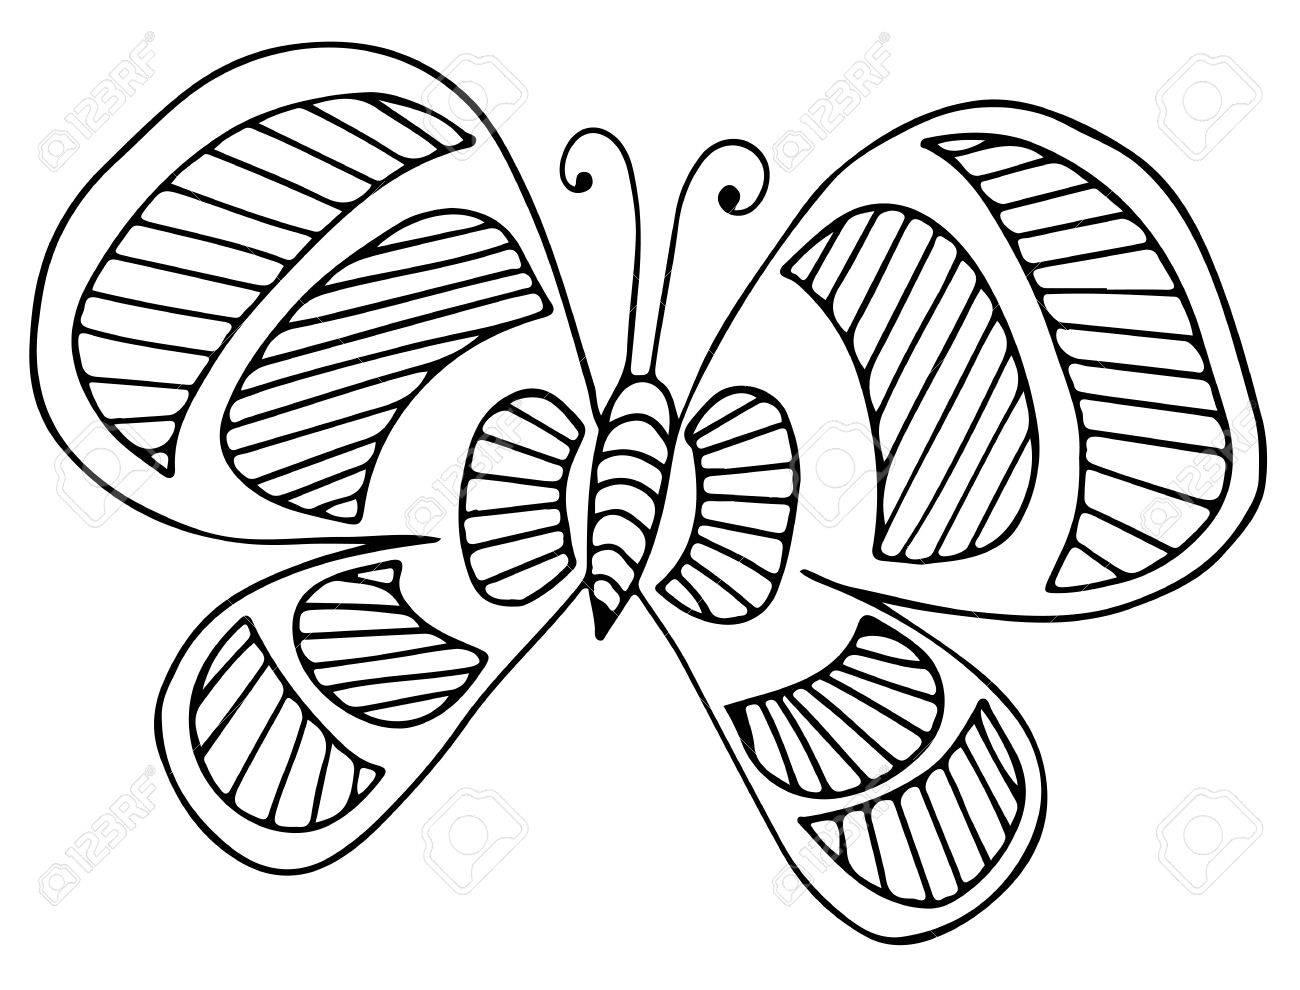 Mariposa Negro Línea De Tarjetas De Felicitación, Libros Para ...